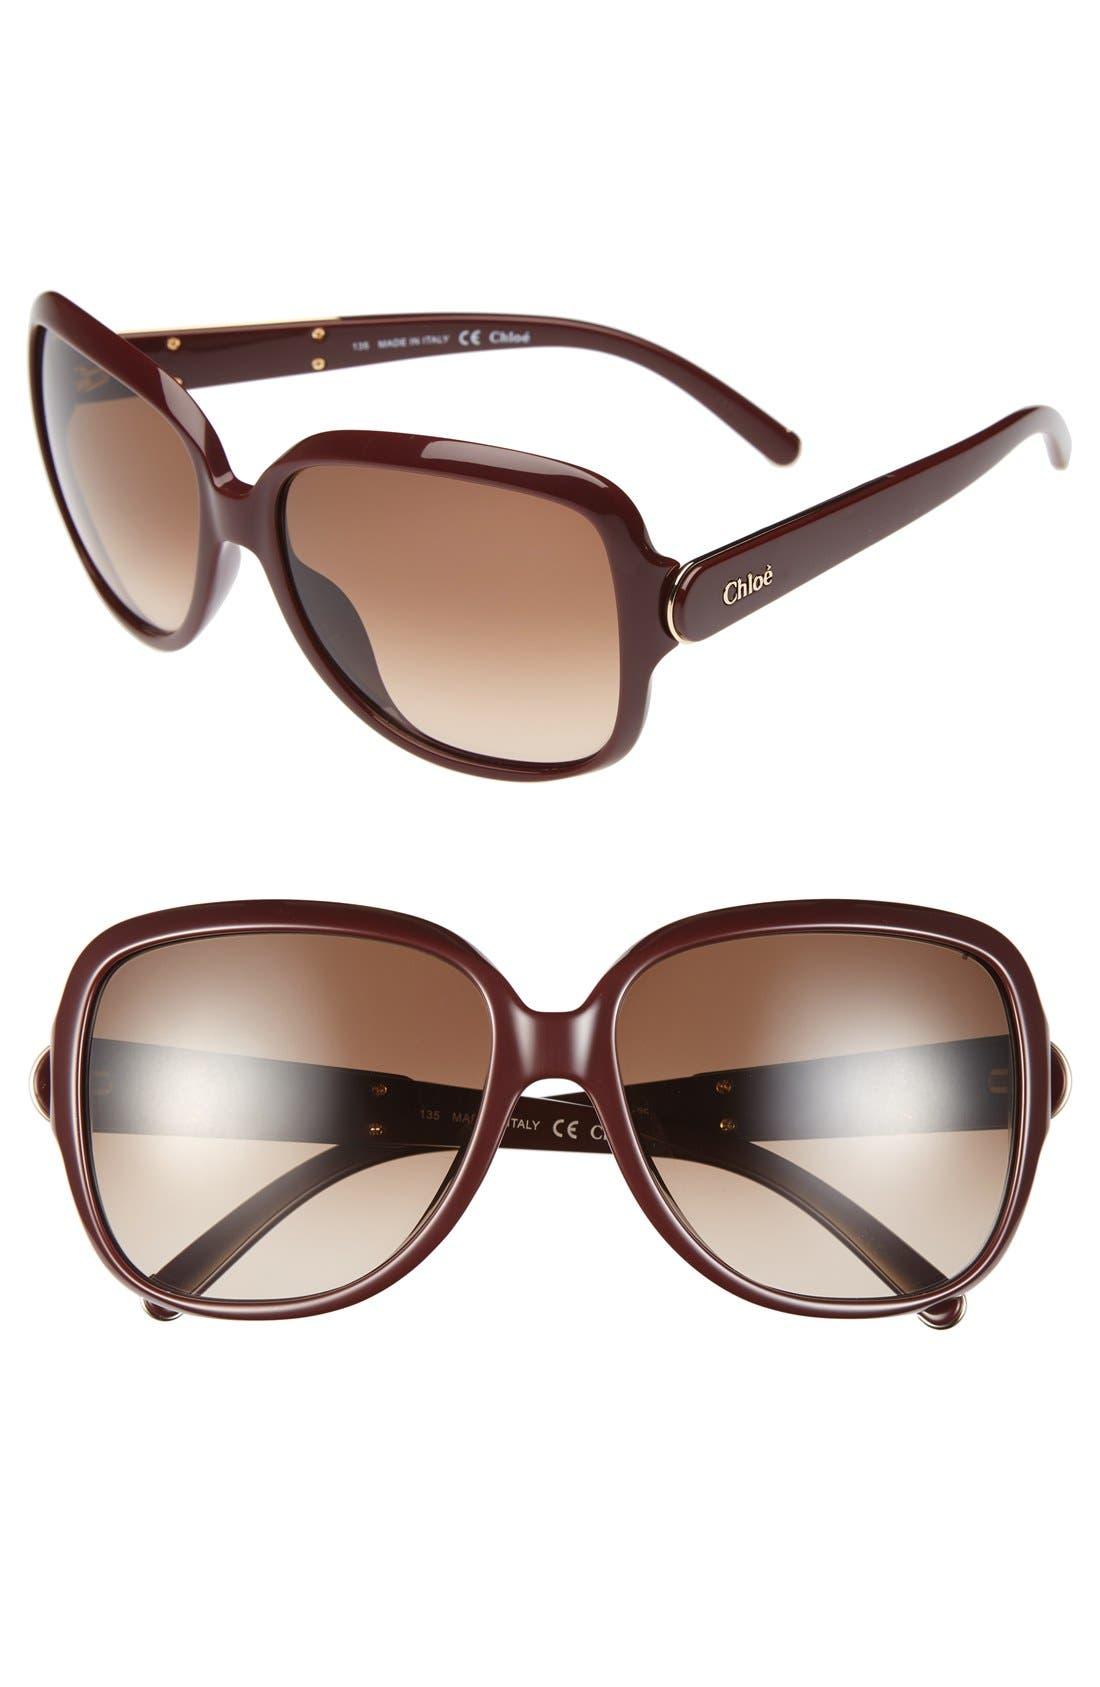 Main Image - Chloé 59mm Sunglasses